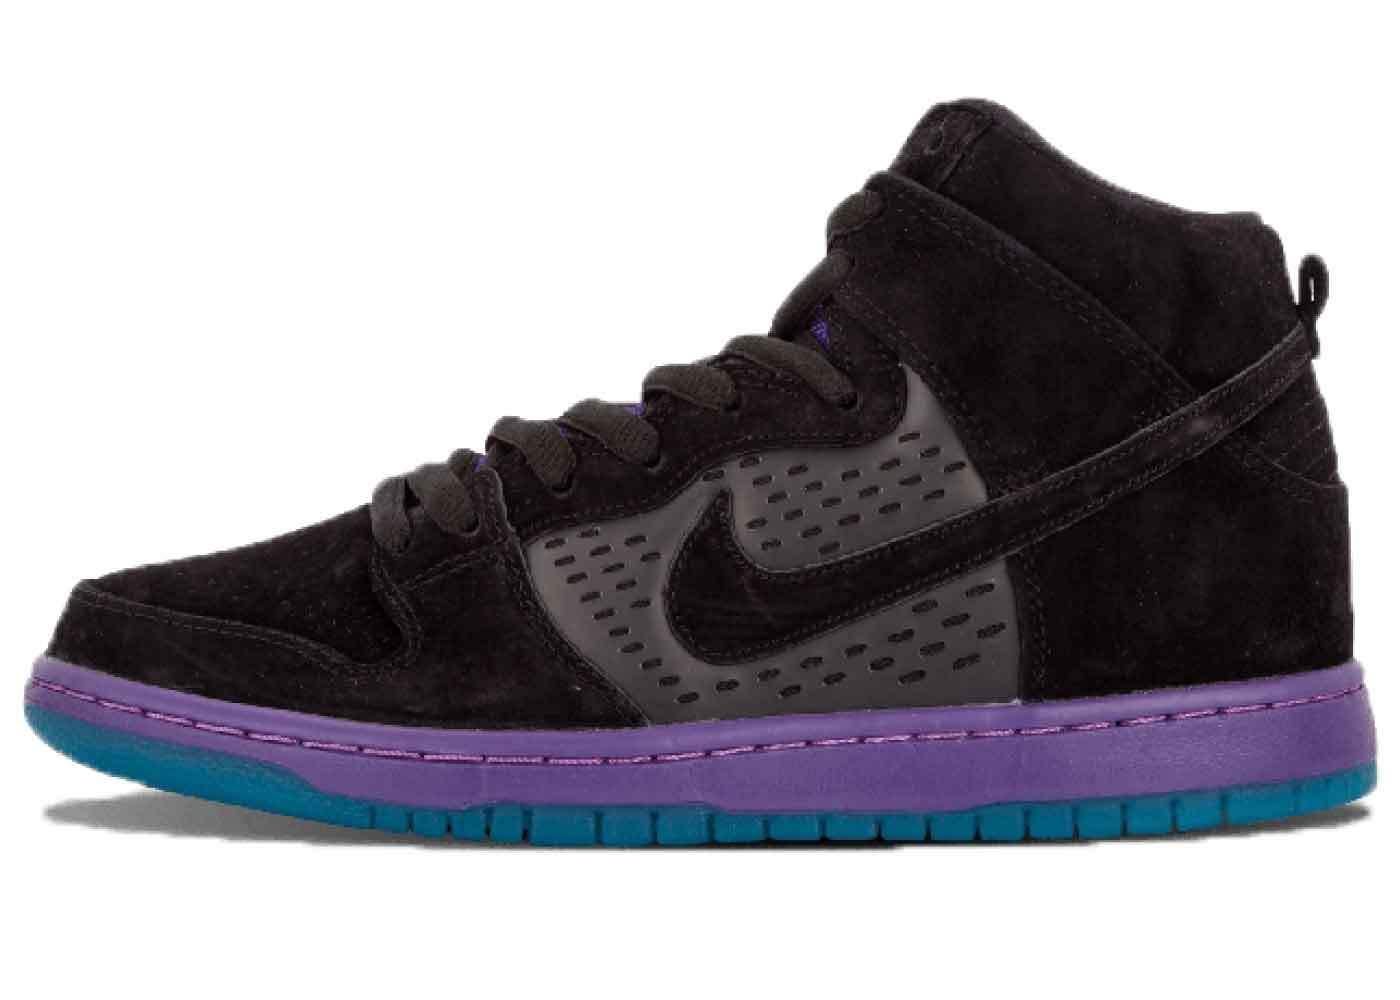 Nike SB Dunk High Black Grapeの写真